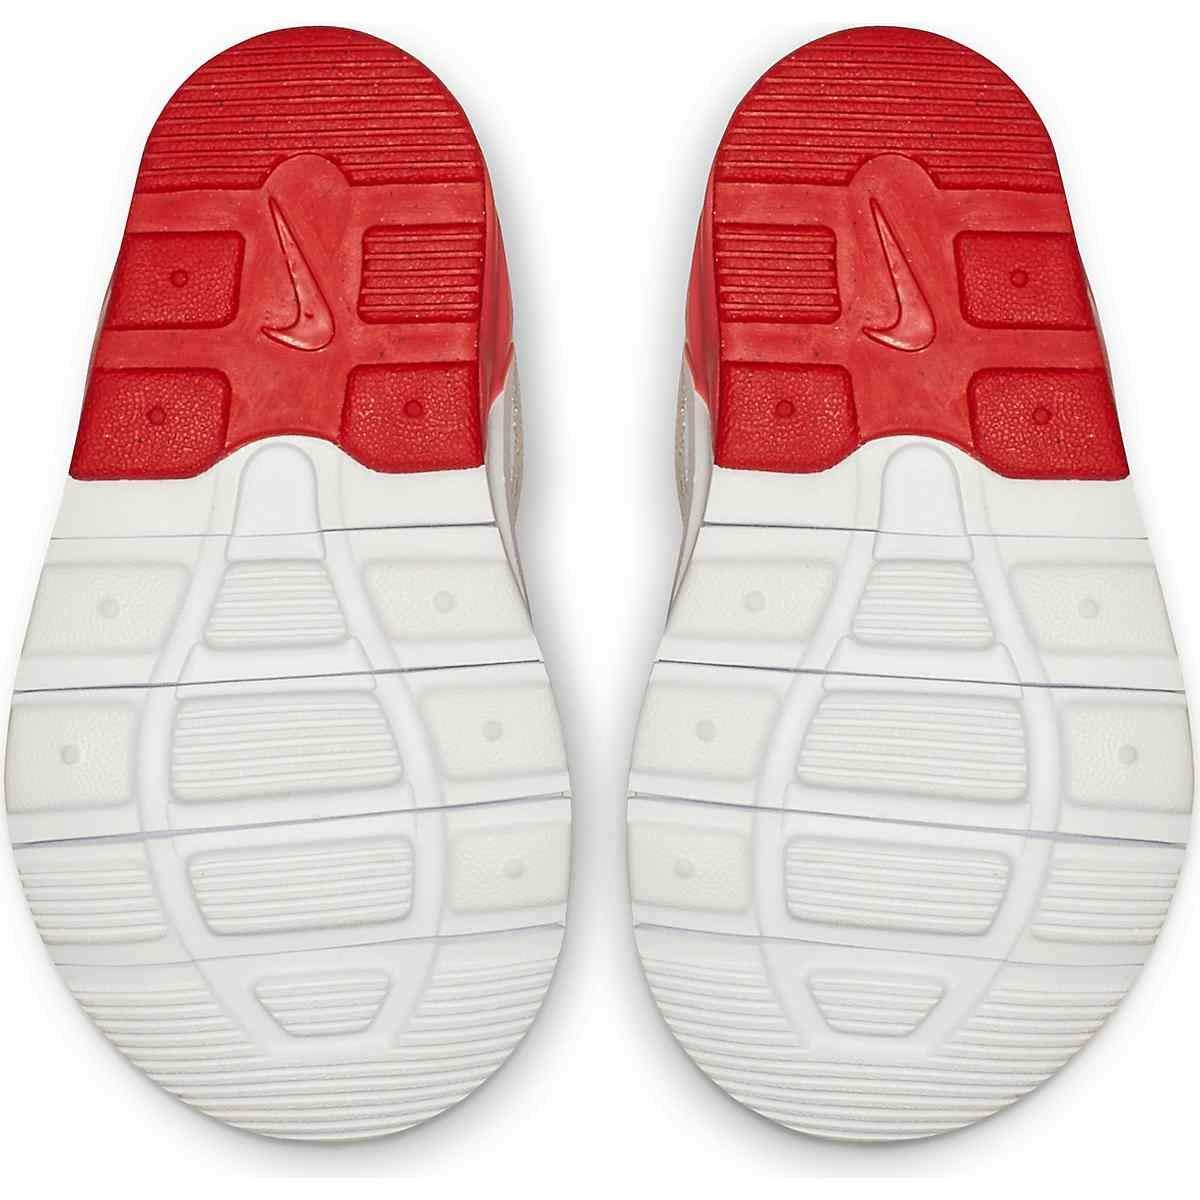 Chaussons Bas Mixte b/éb/é Nike Air Max Motion 2 TDE